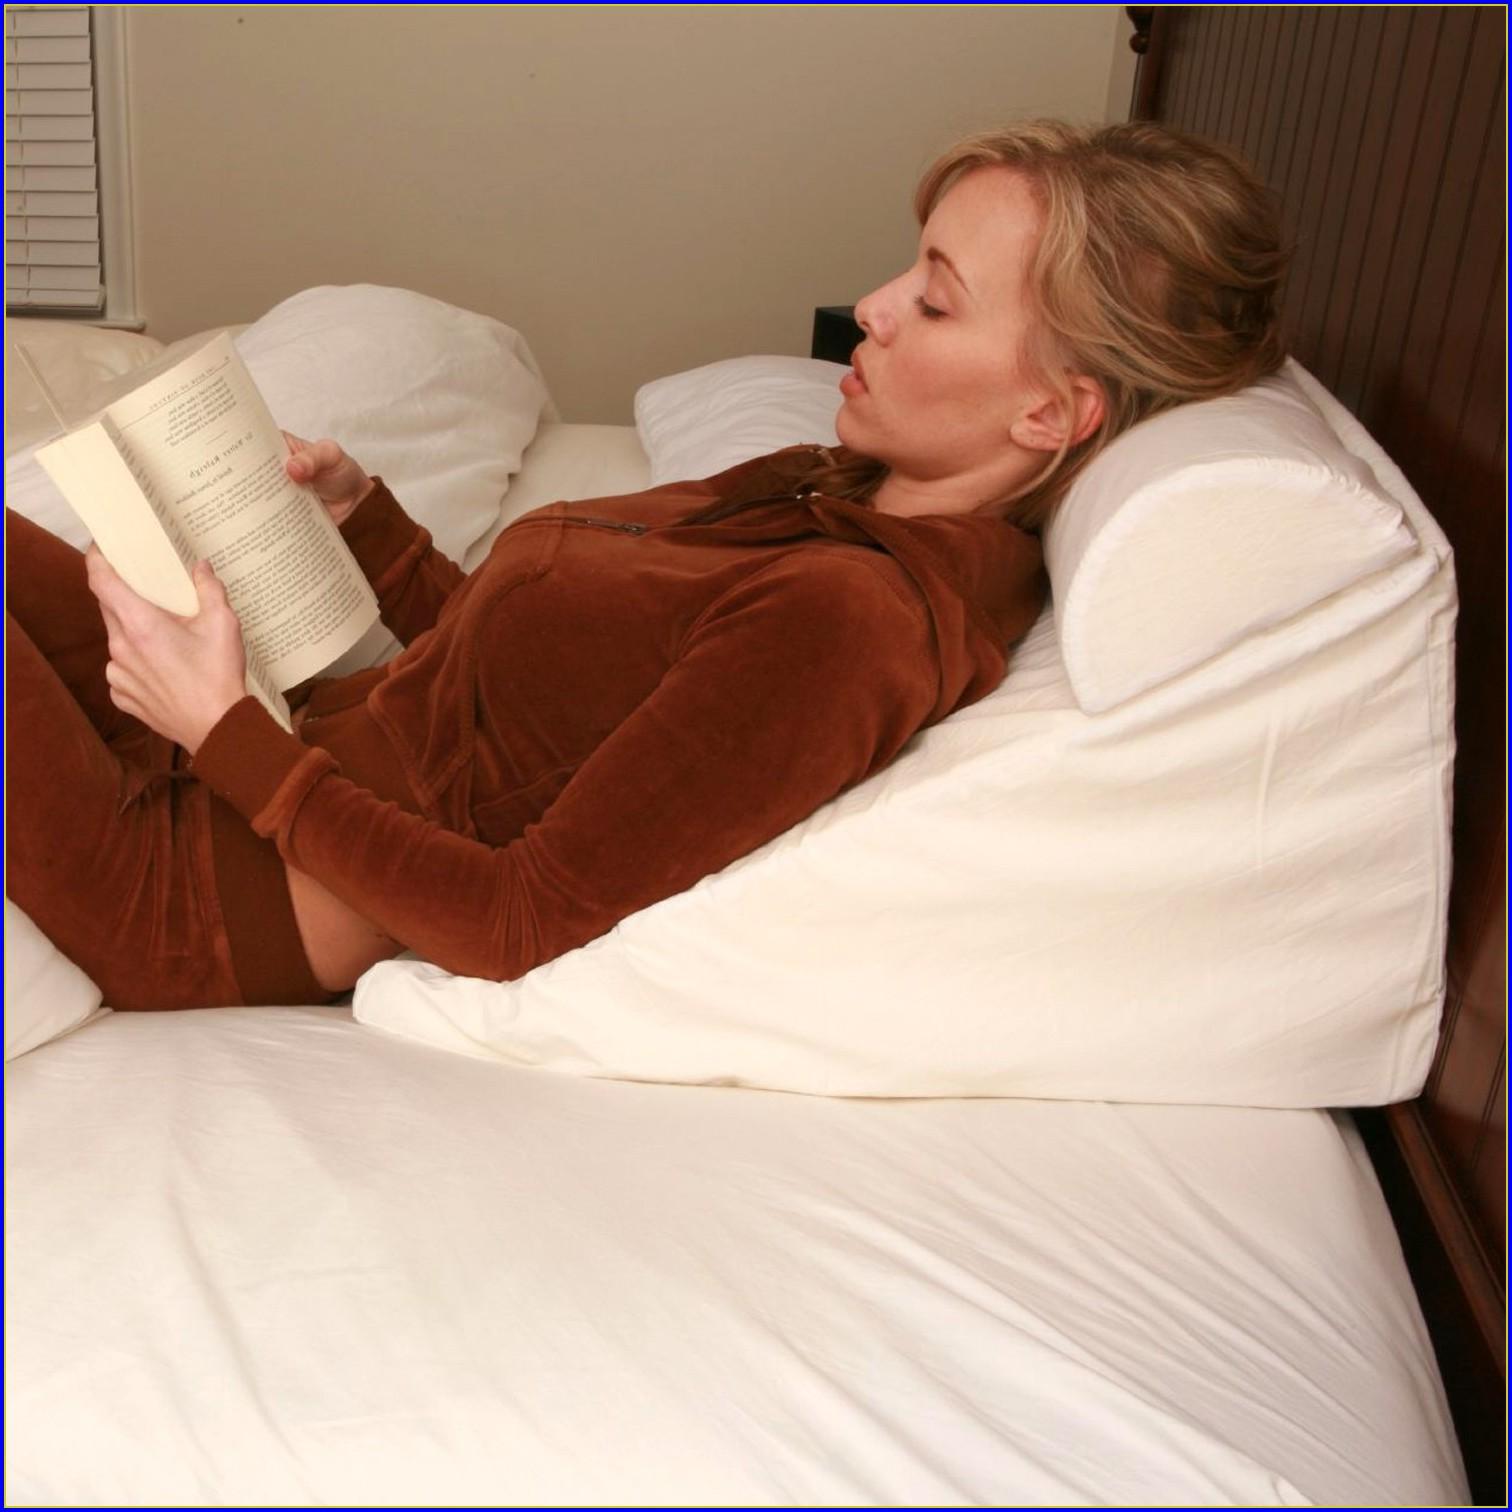 Bed Wedge Pillow Acid Reflux